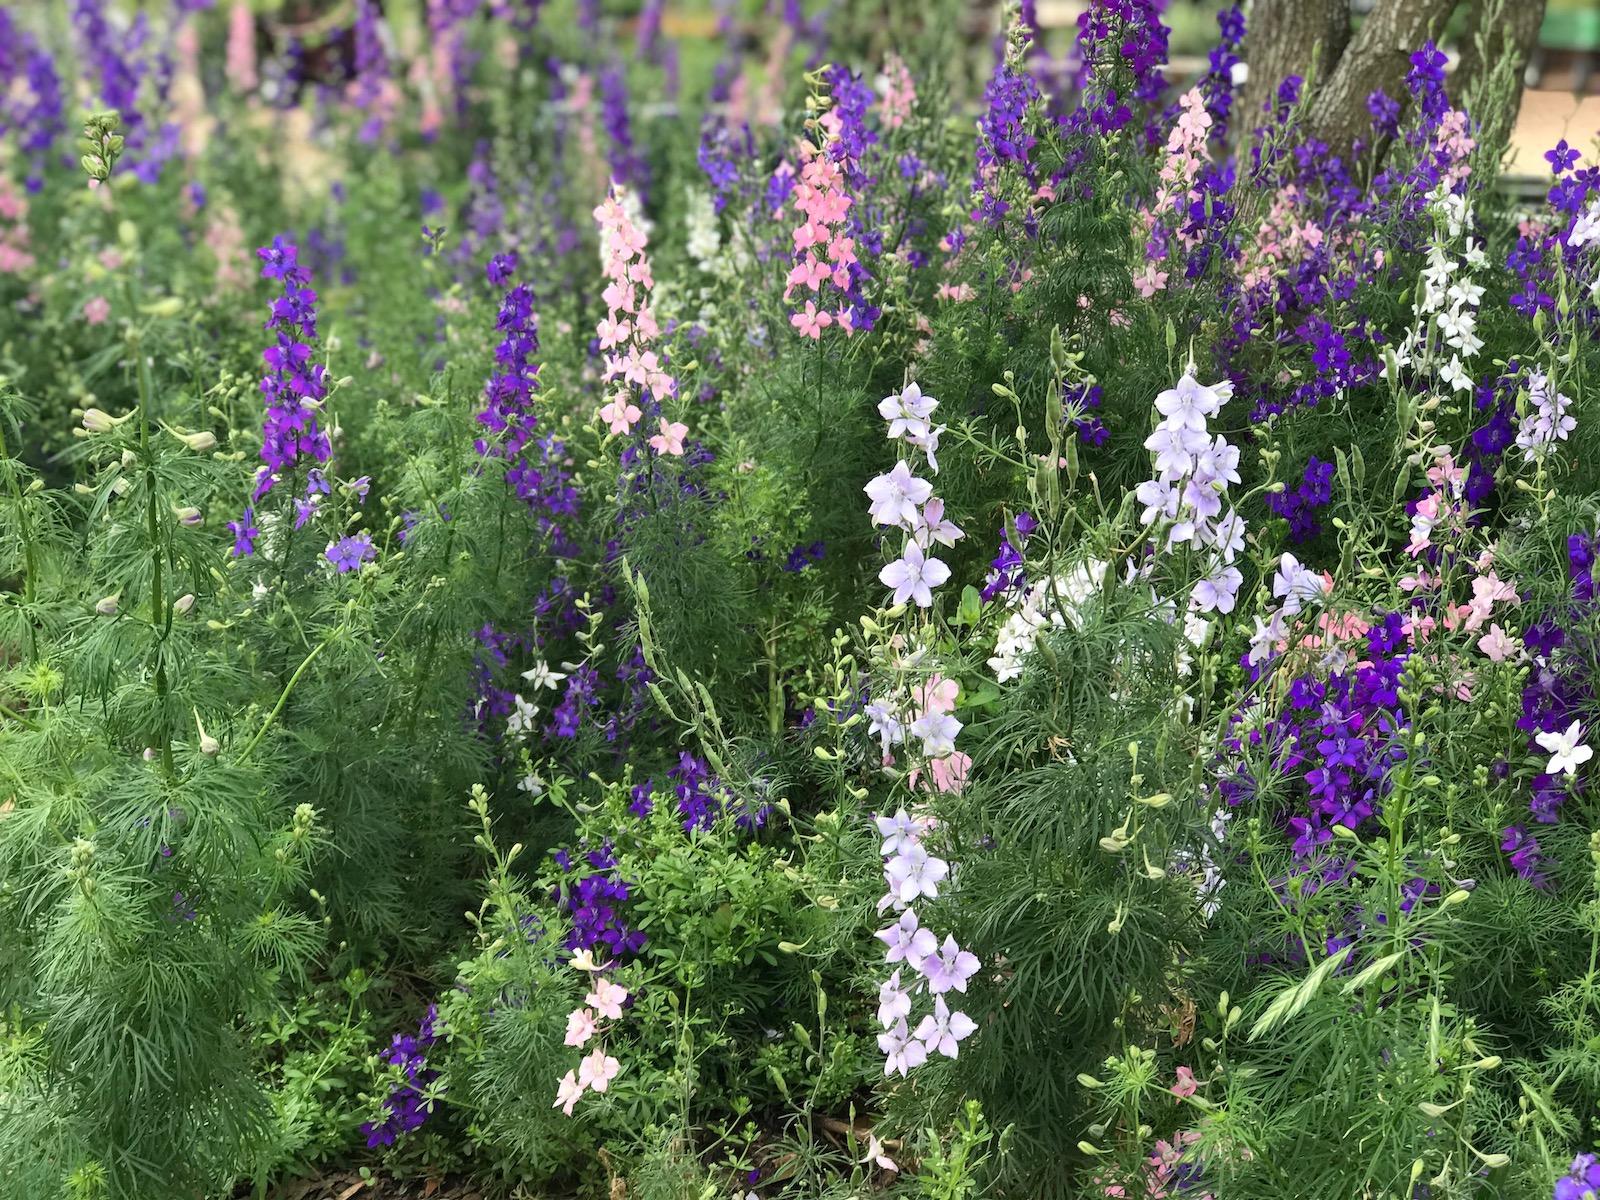 wildflowers larkspur poppy fredericksburg 2018 IMG_7718